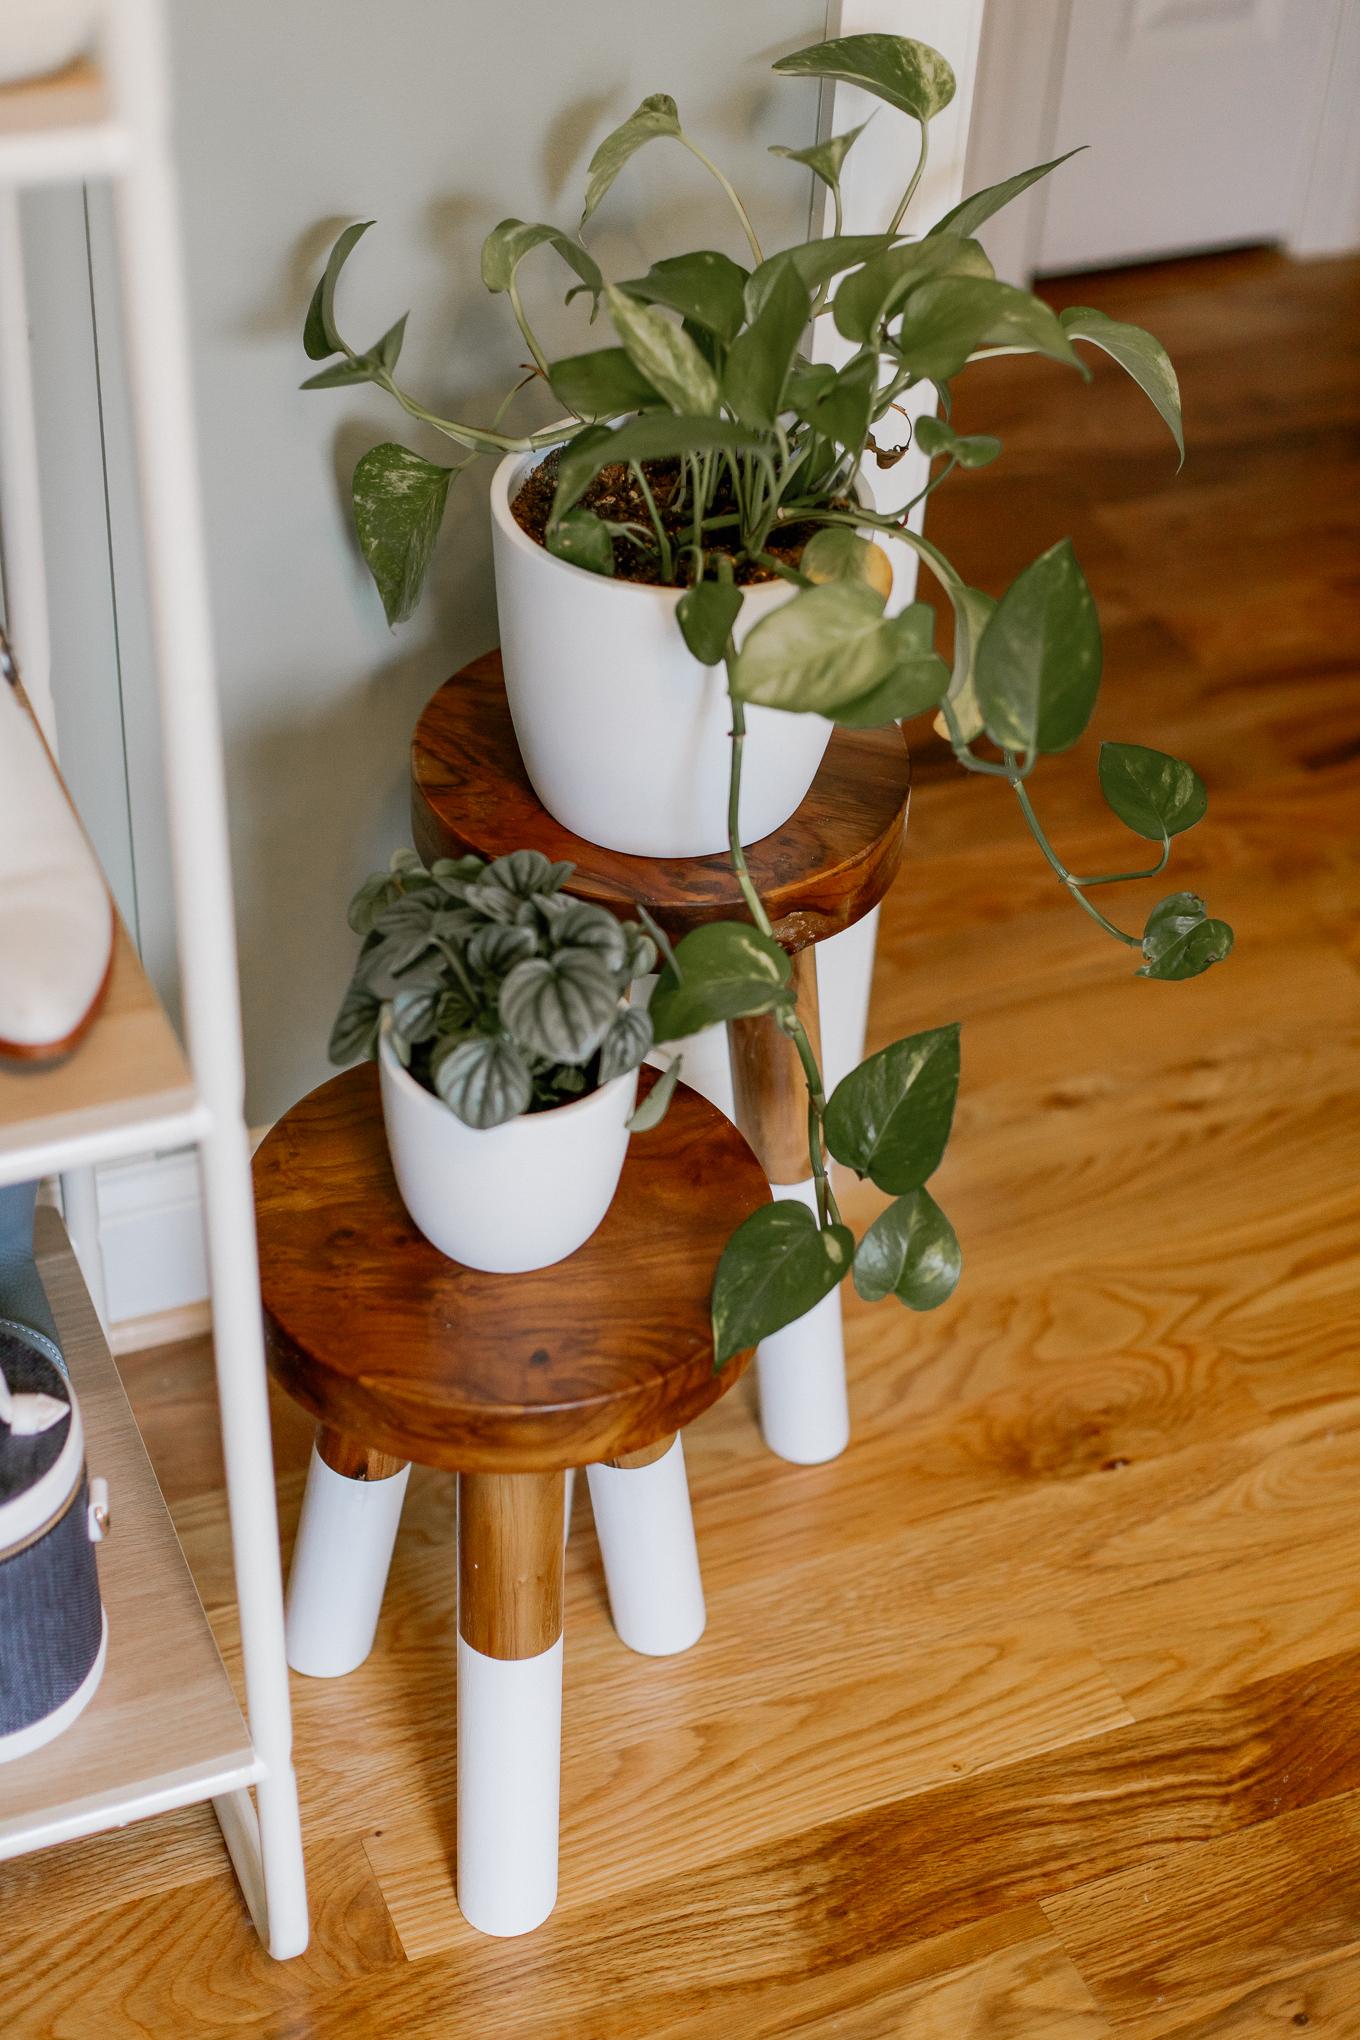 Wood Stools, Dip-Dyed Stools | Louella Reese